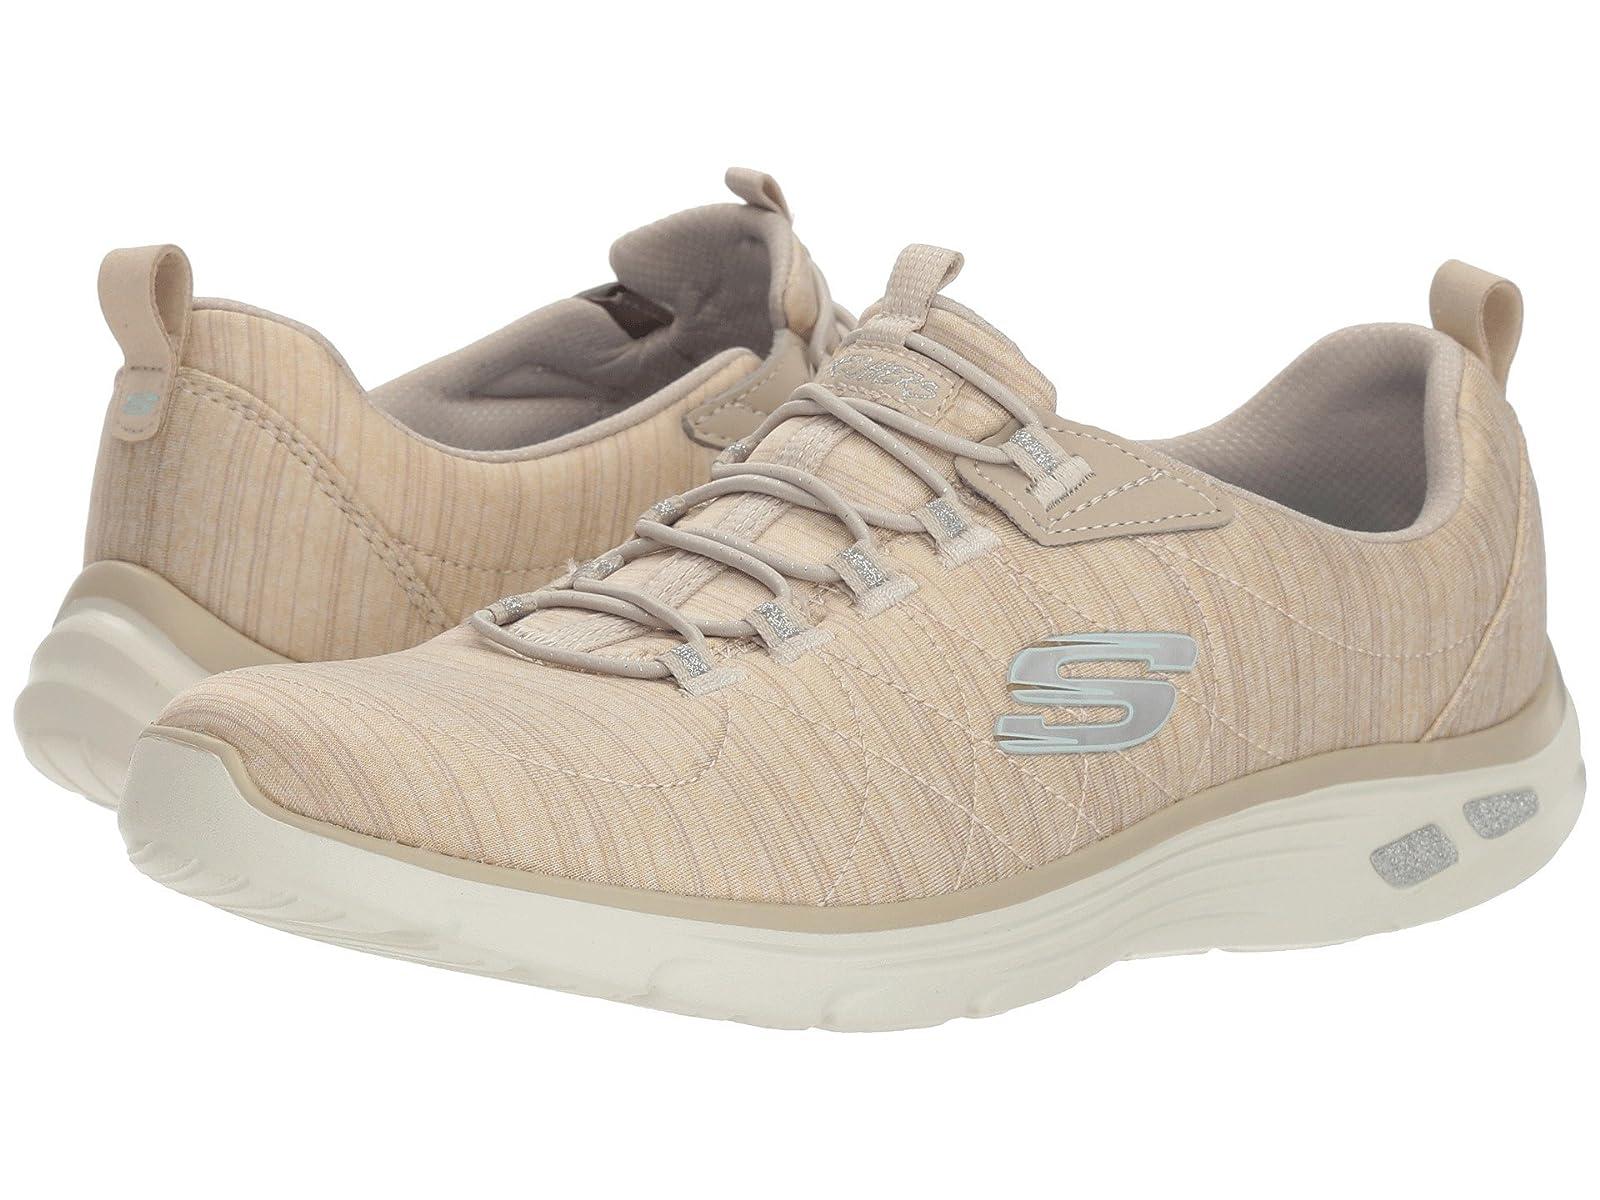 SKECHERS Empire D'LuxAtmospheric grades have affordable shoes